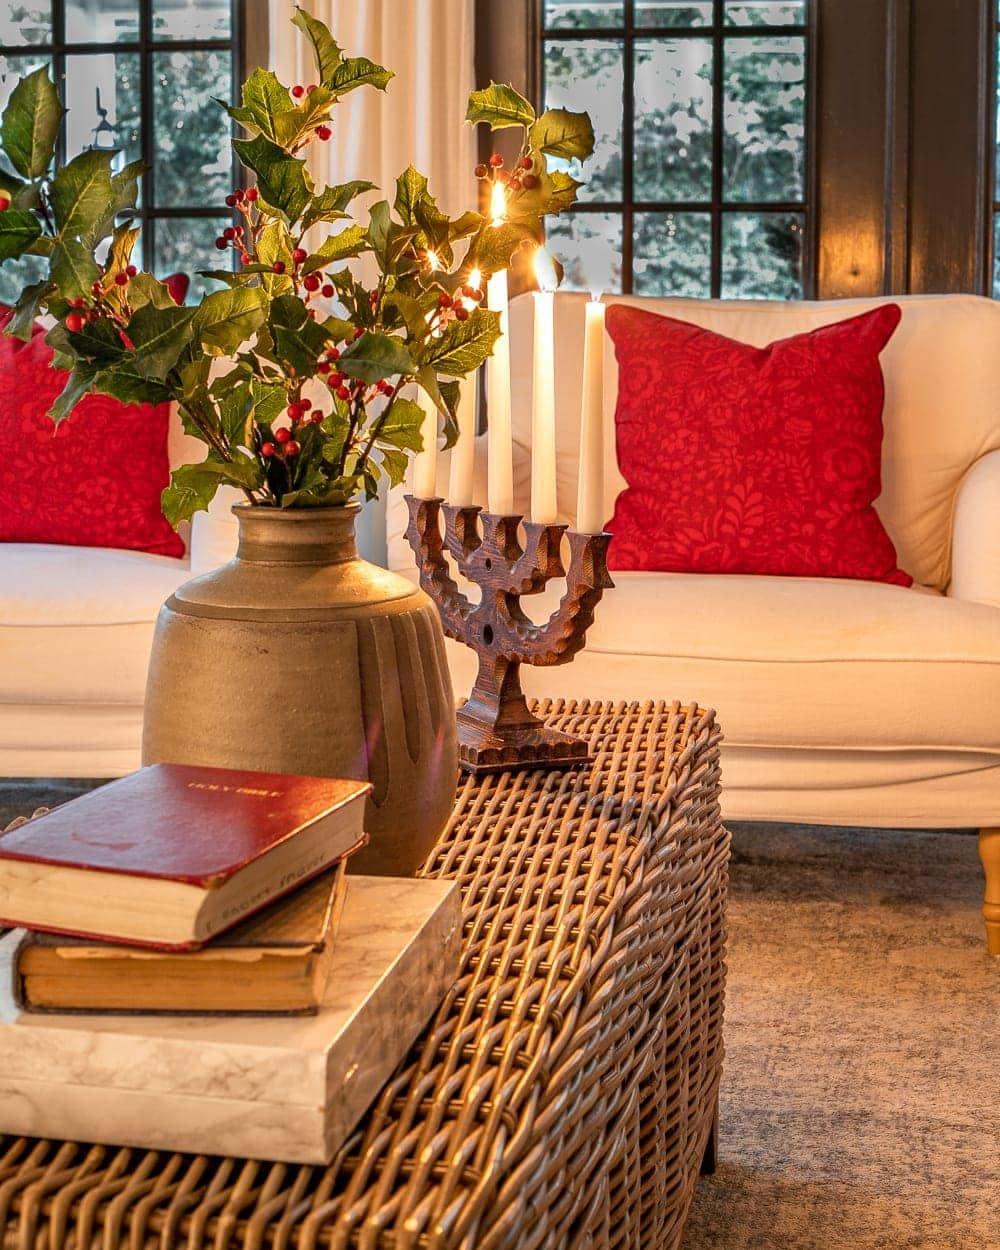 Christmas candlelight coffee table vignette living room